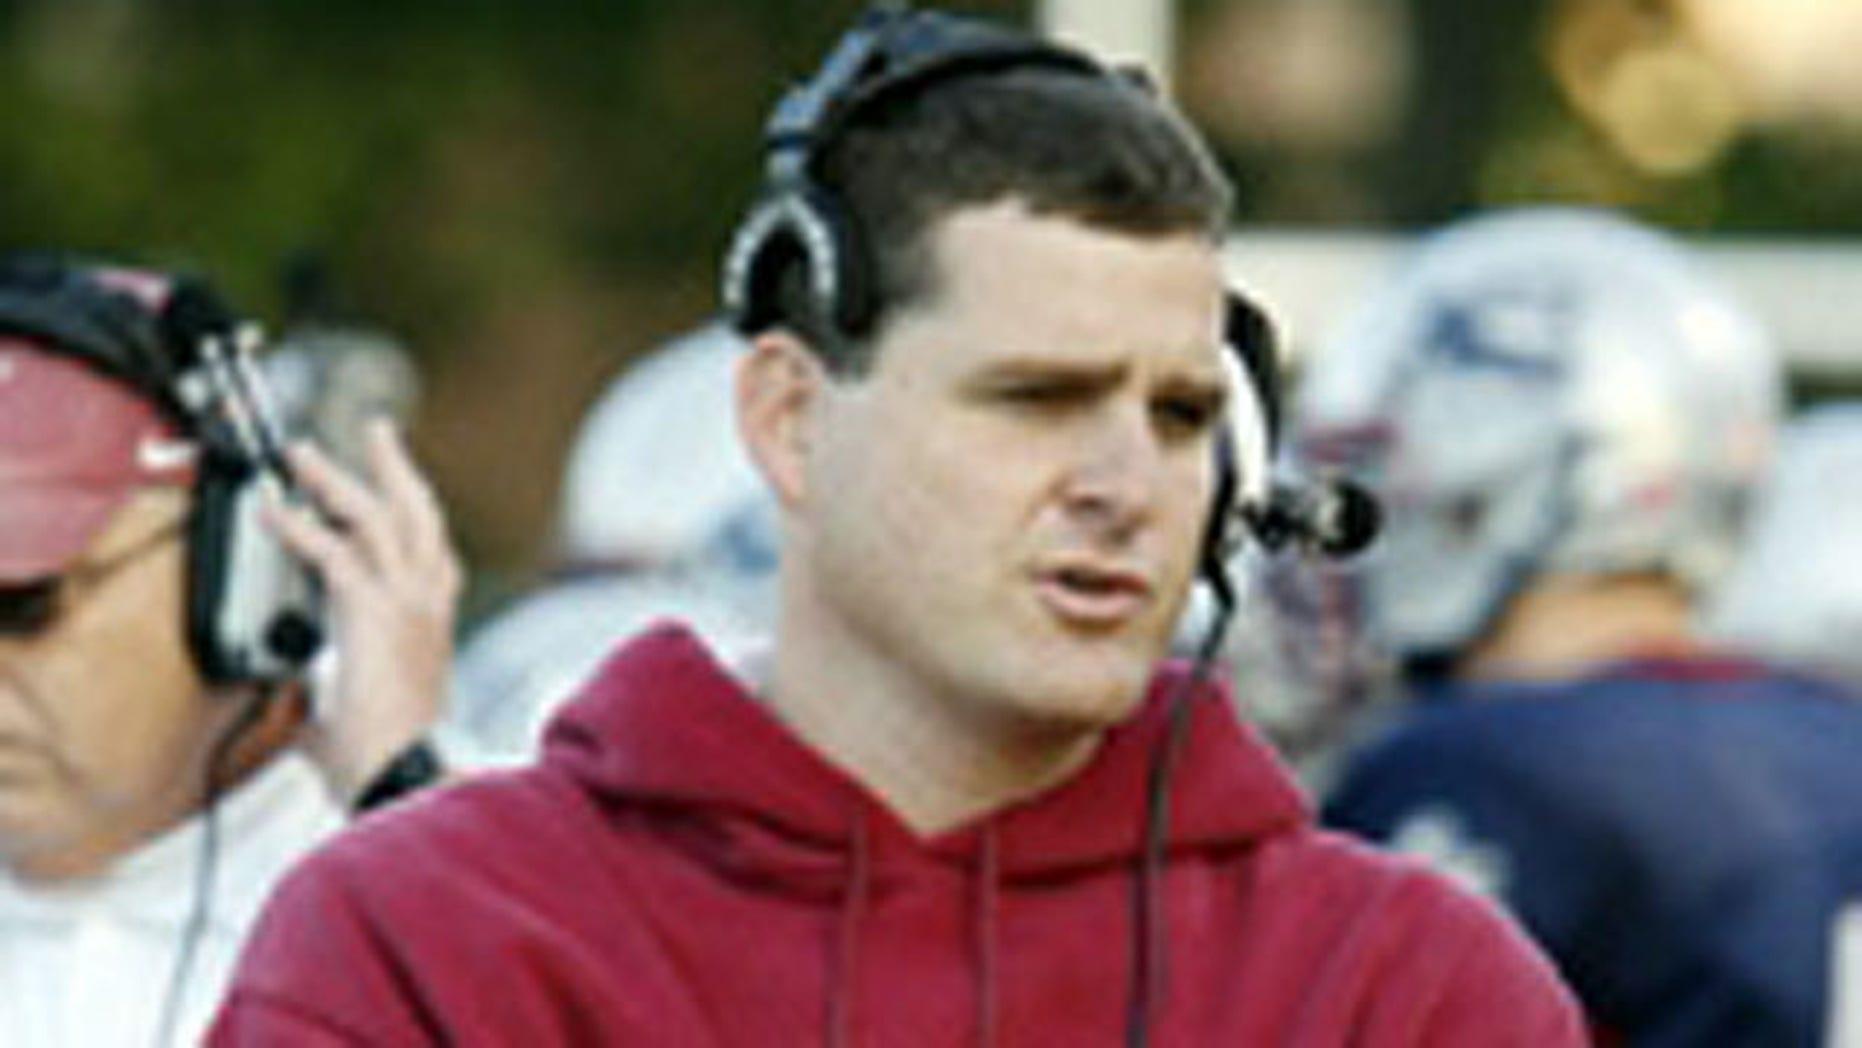 Maritime College football coach Clayton Kendrick-Holmes